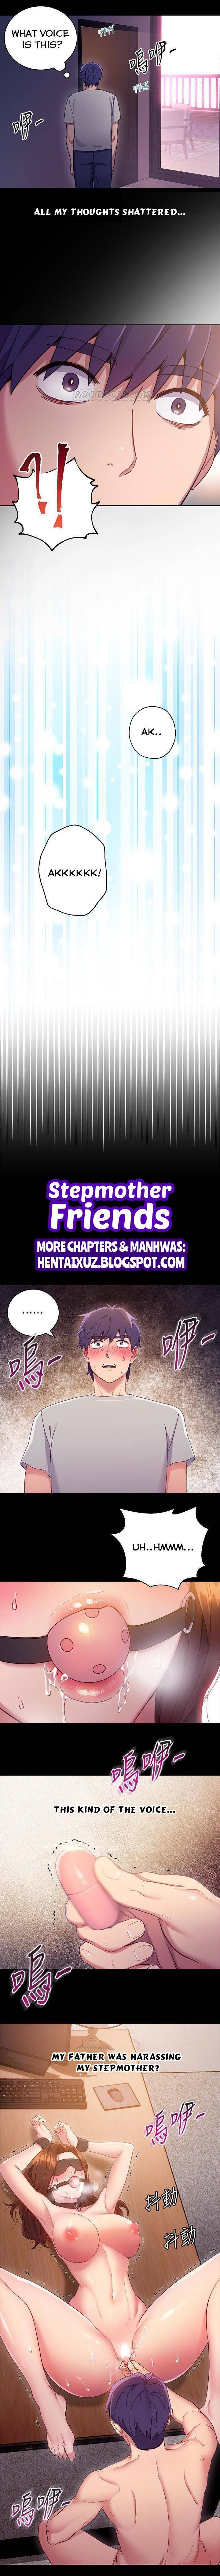 [Neck Pilllow] Stepmother Friends Ch.39/? [English] [Hentai Universe] NEW! 13/10/2020 101